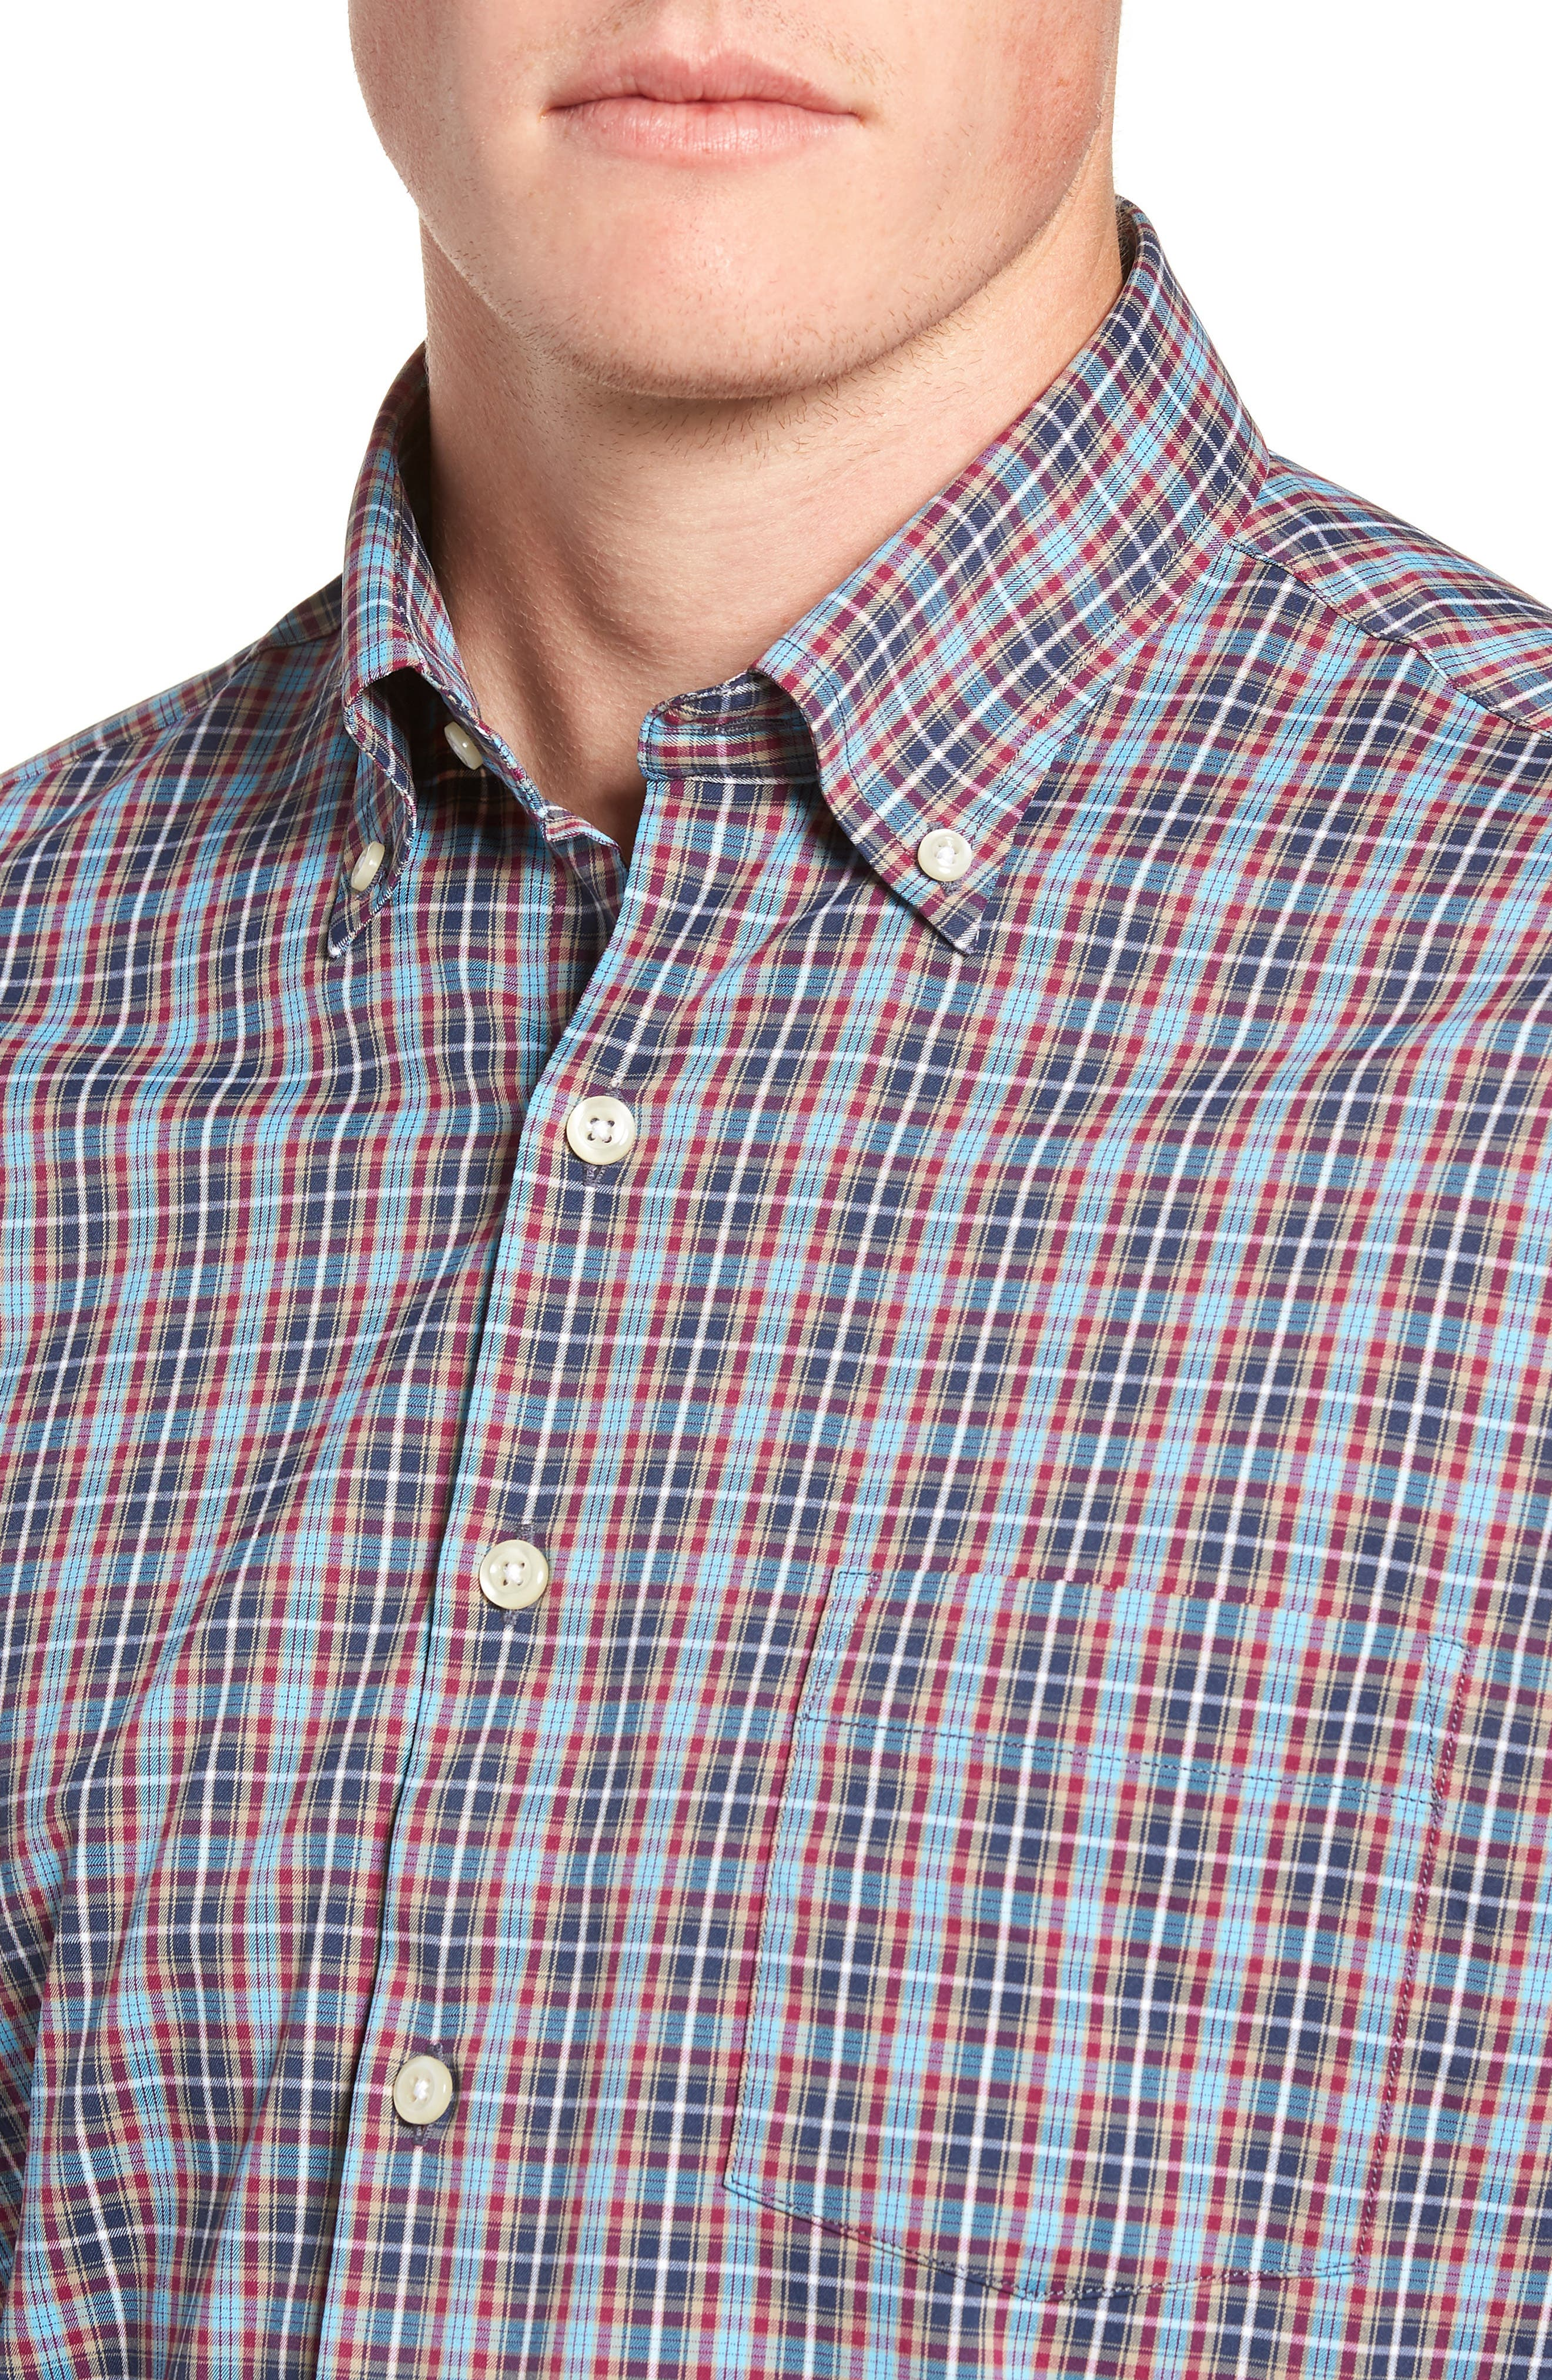 Clyde Plaid Performance Sport Shirt,                             Alternate thumbnail 2, color,                             NAVY